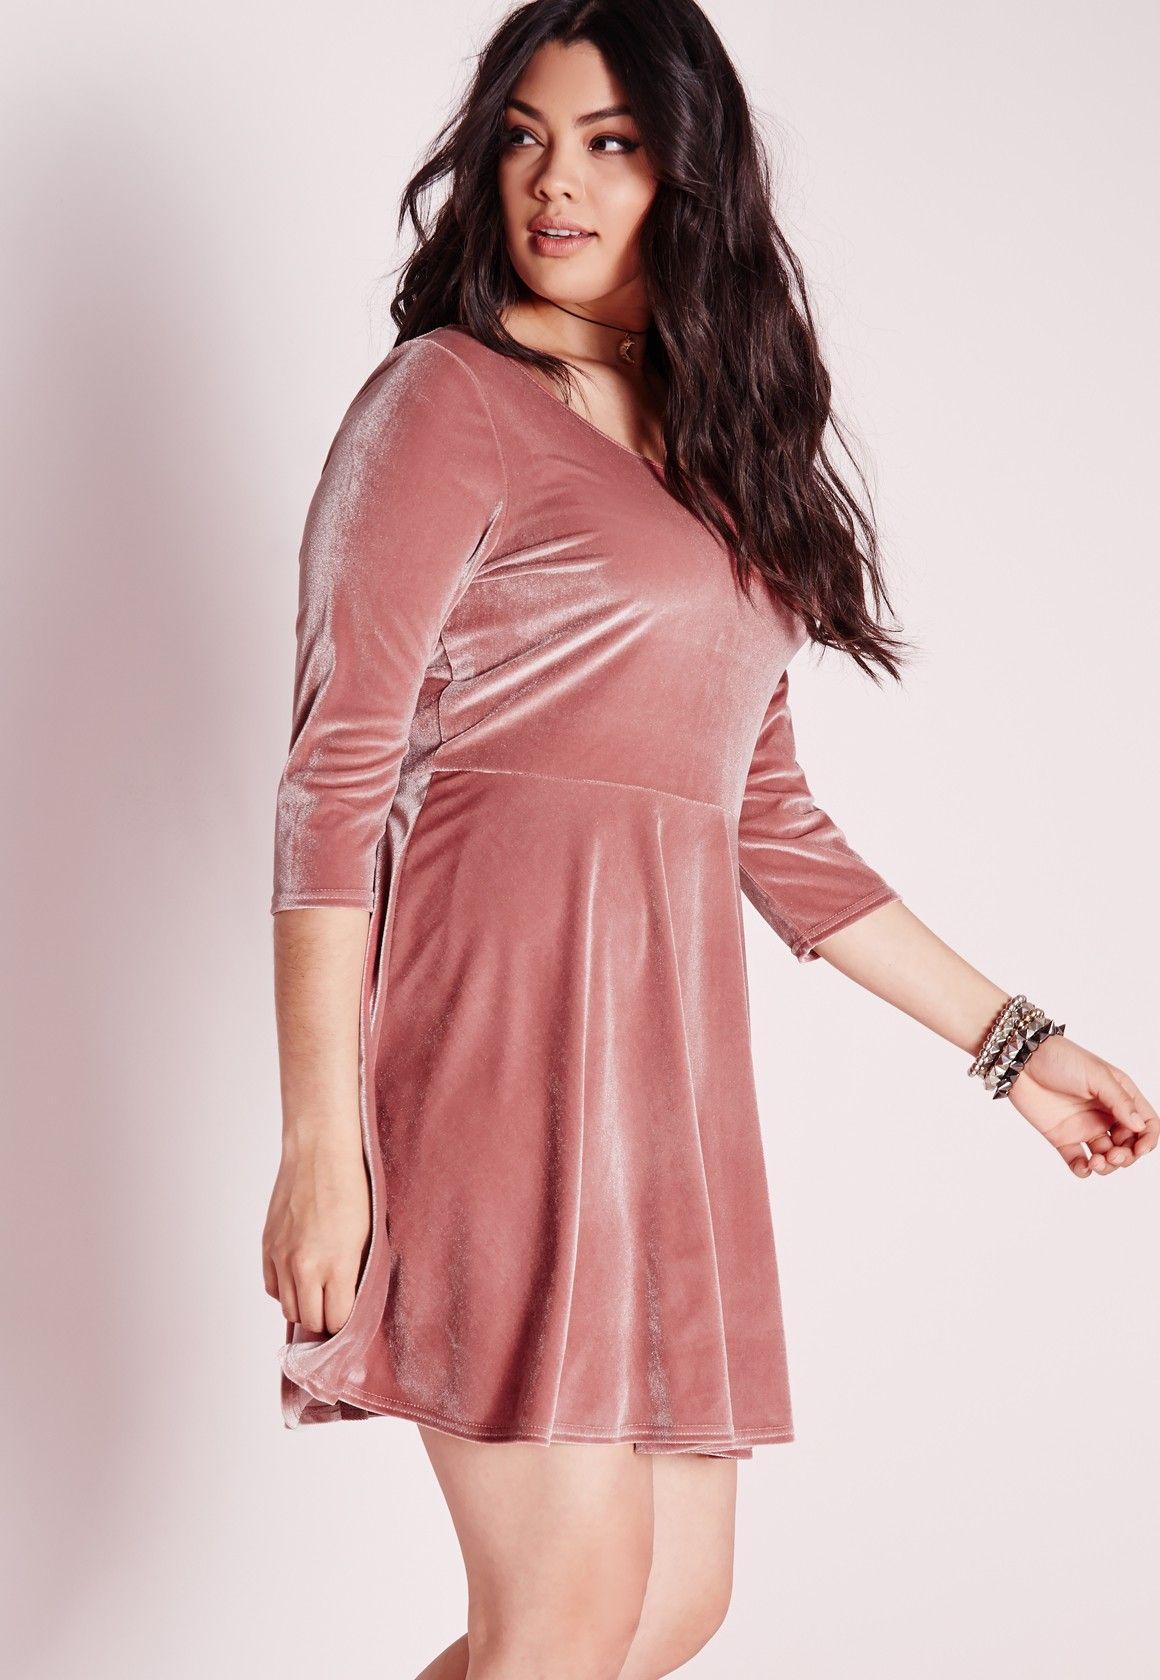 Missguided - Plus Size Velvet Skater Dress Pink | clothes ...